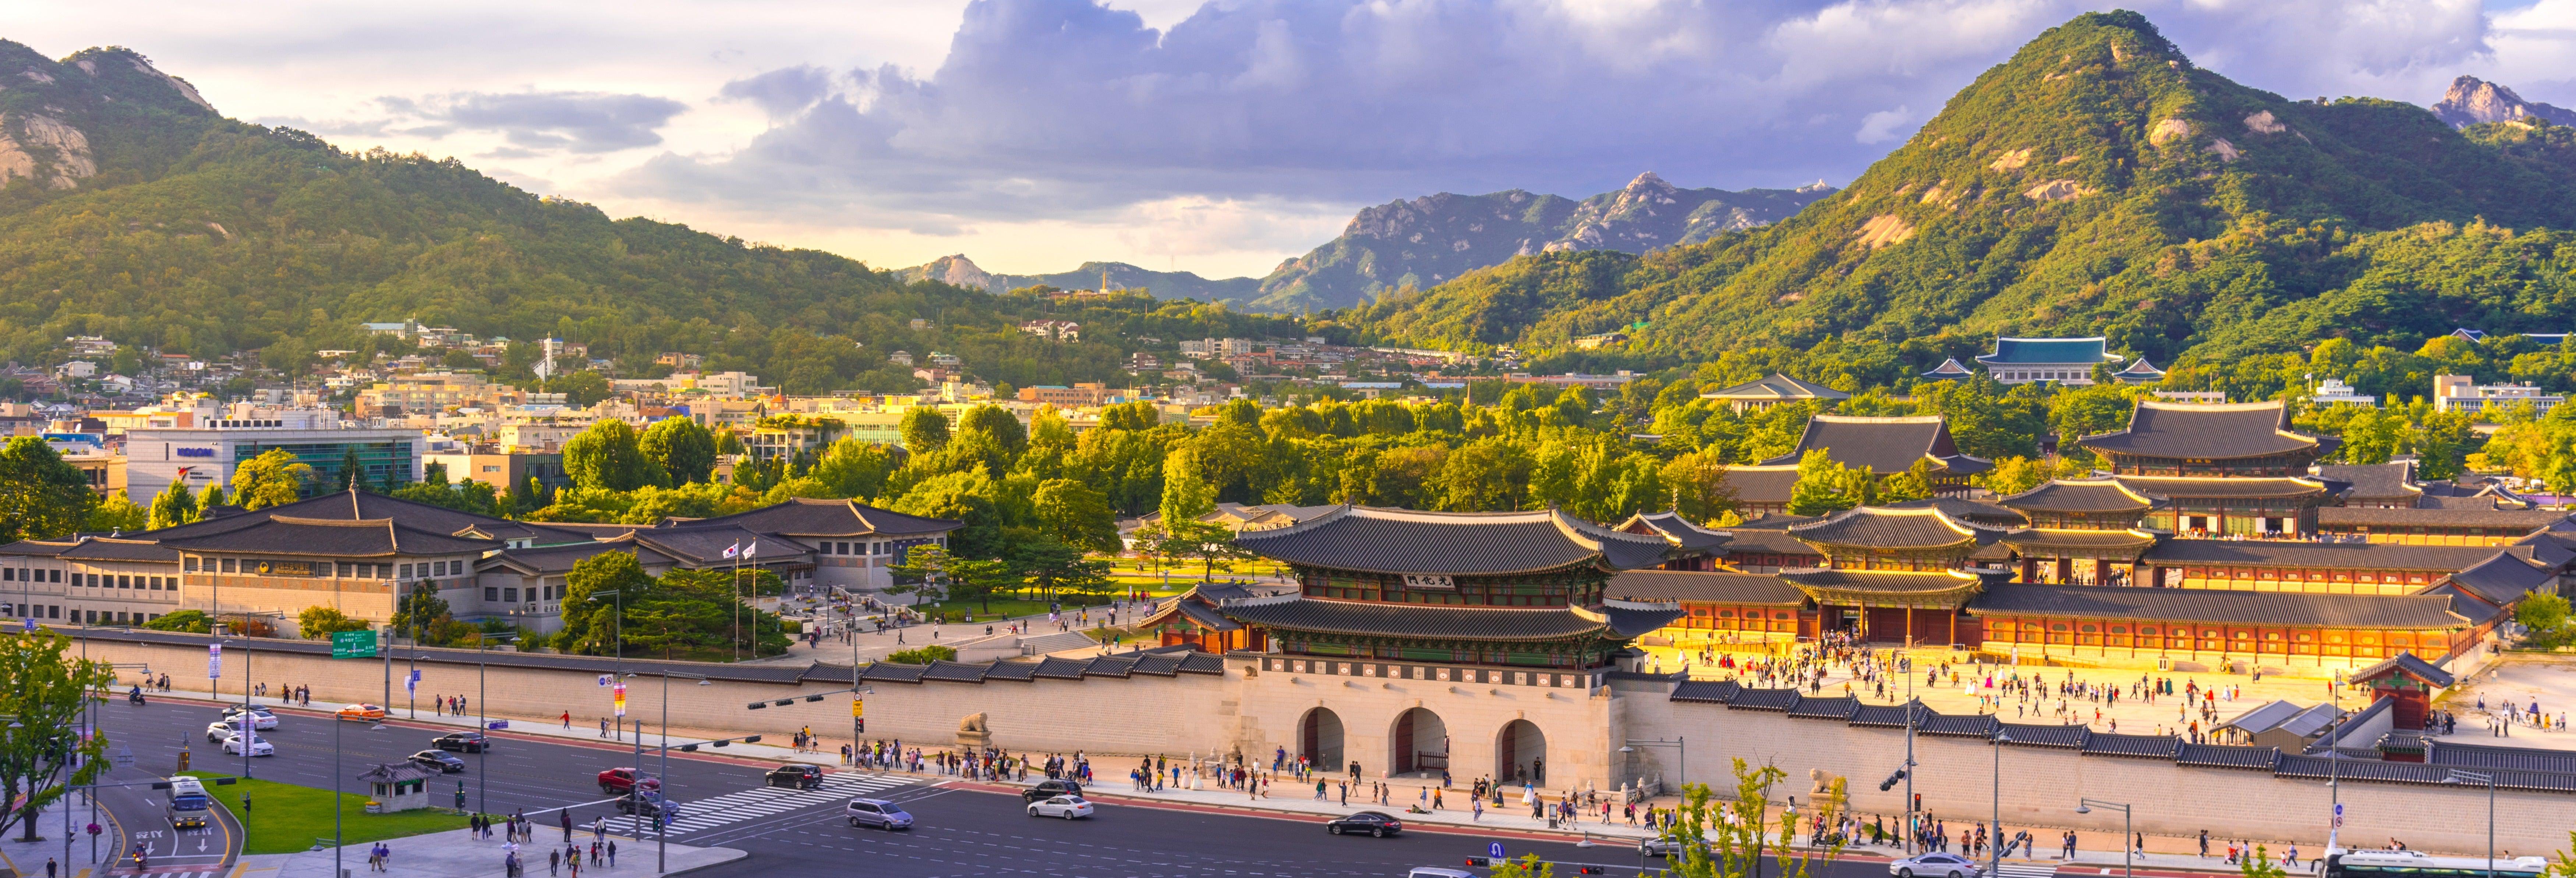 Tour pelo palácio Gyeongbokgung e Bukchon Hanok